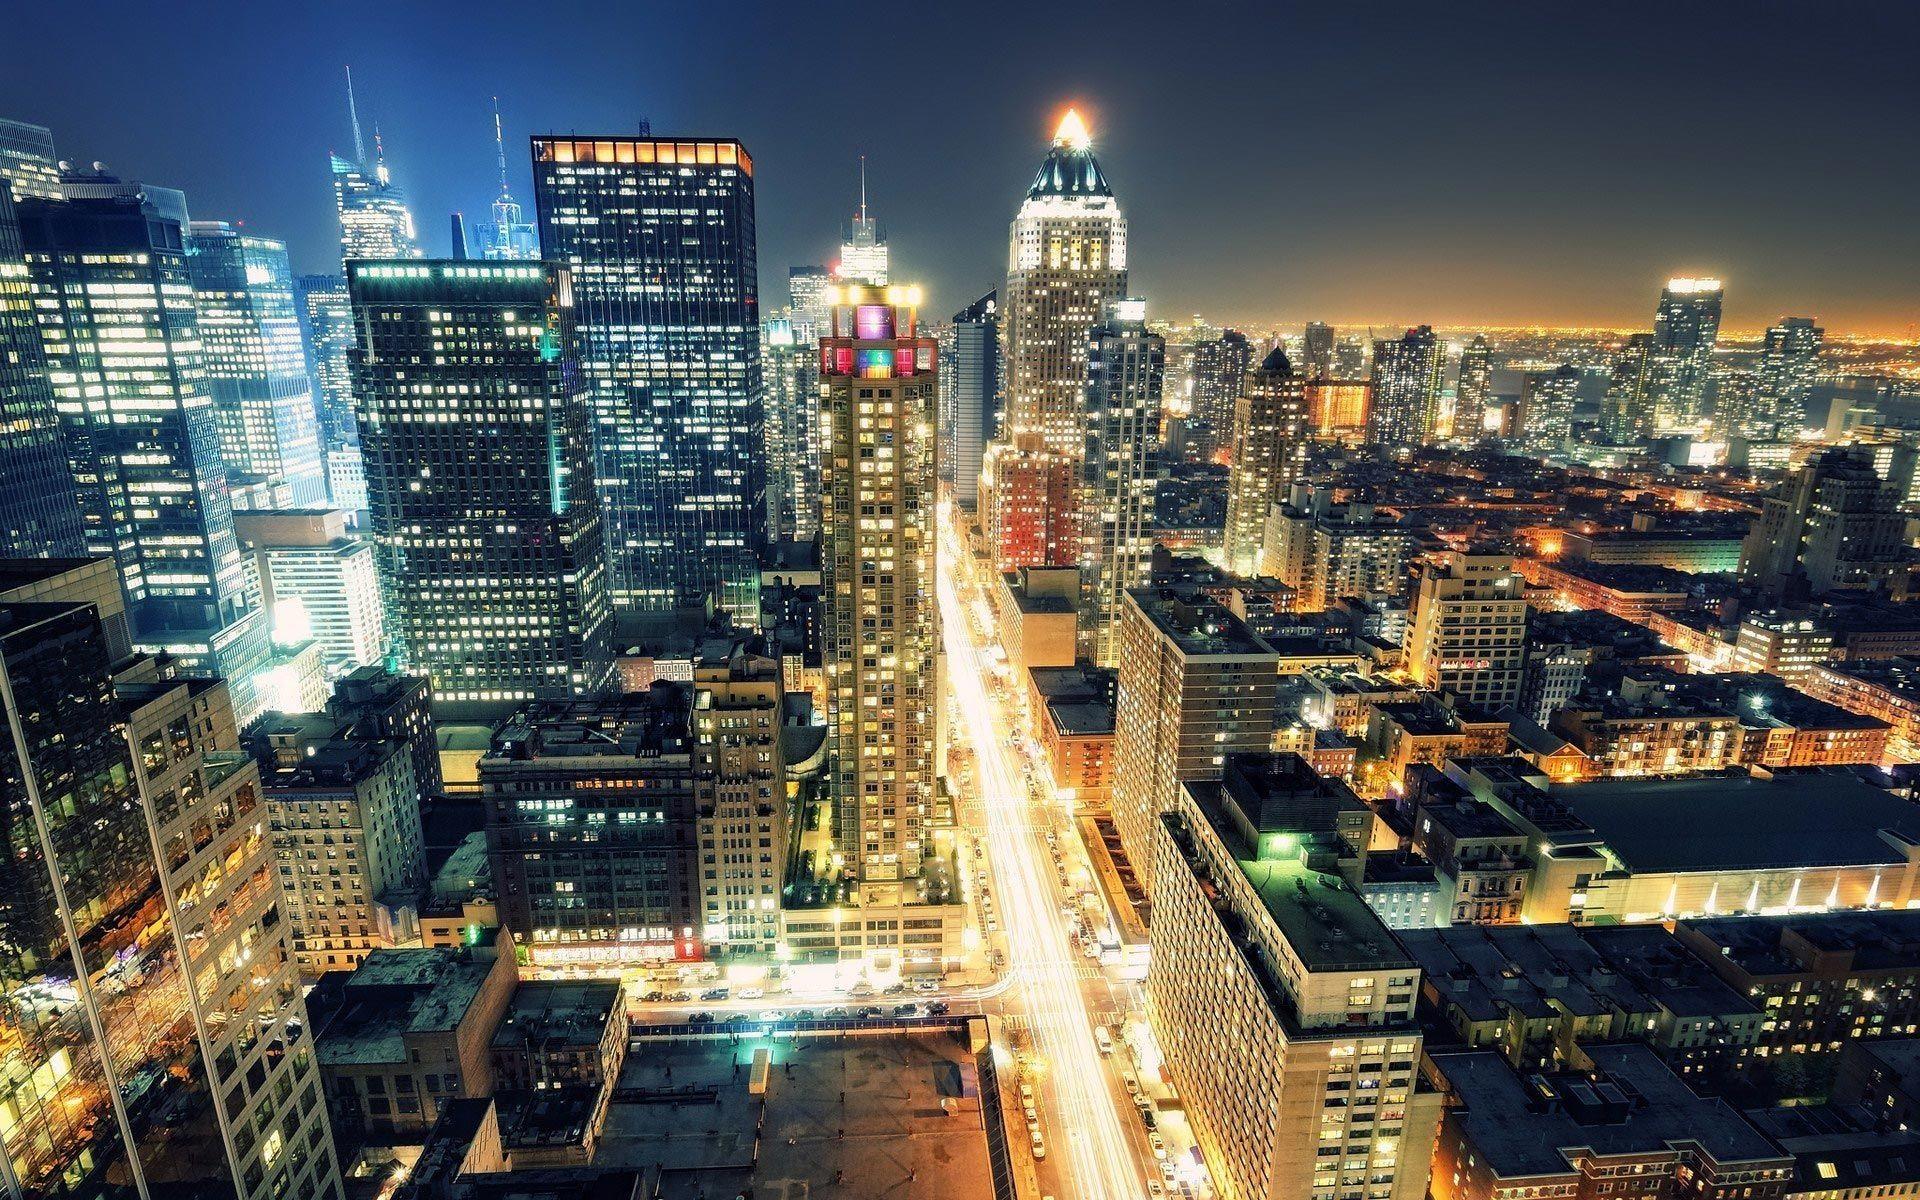 1920x1200, New York City Skyline At Night Wallpaper - New York City Night Scene - HD Wallpaper